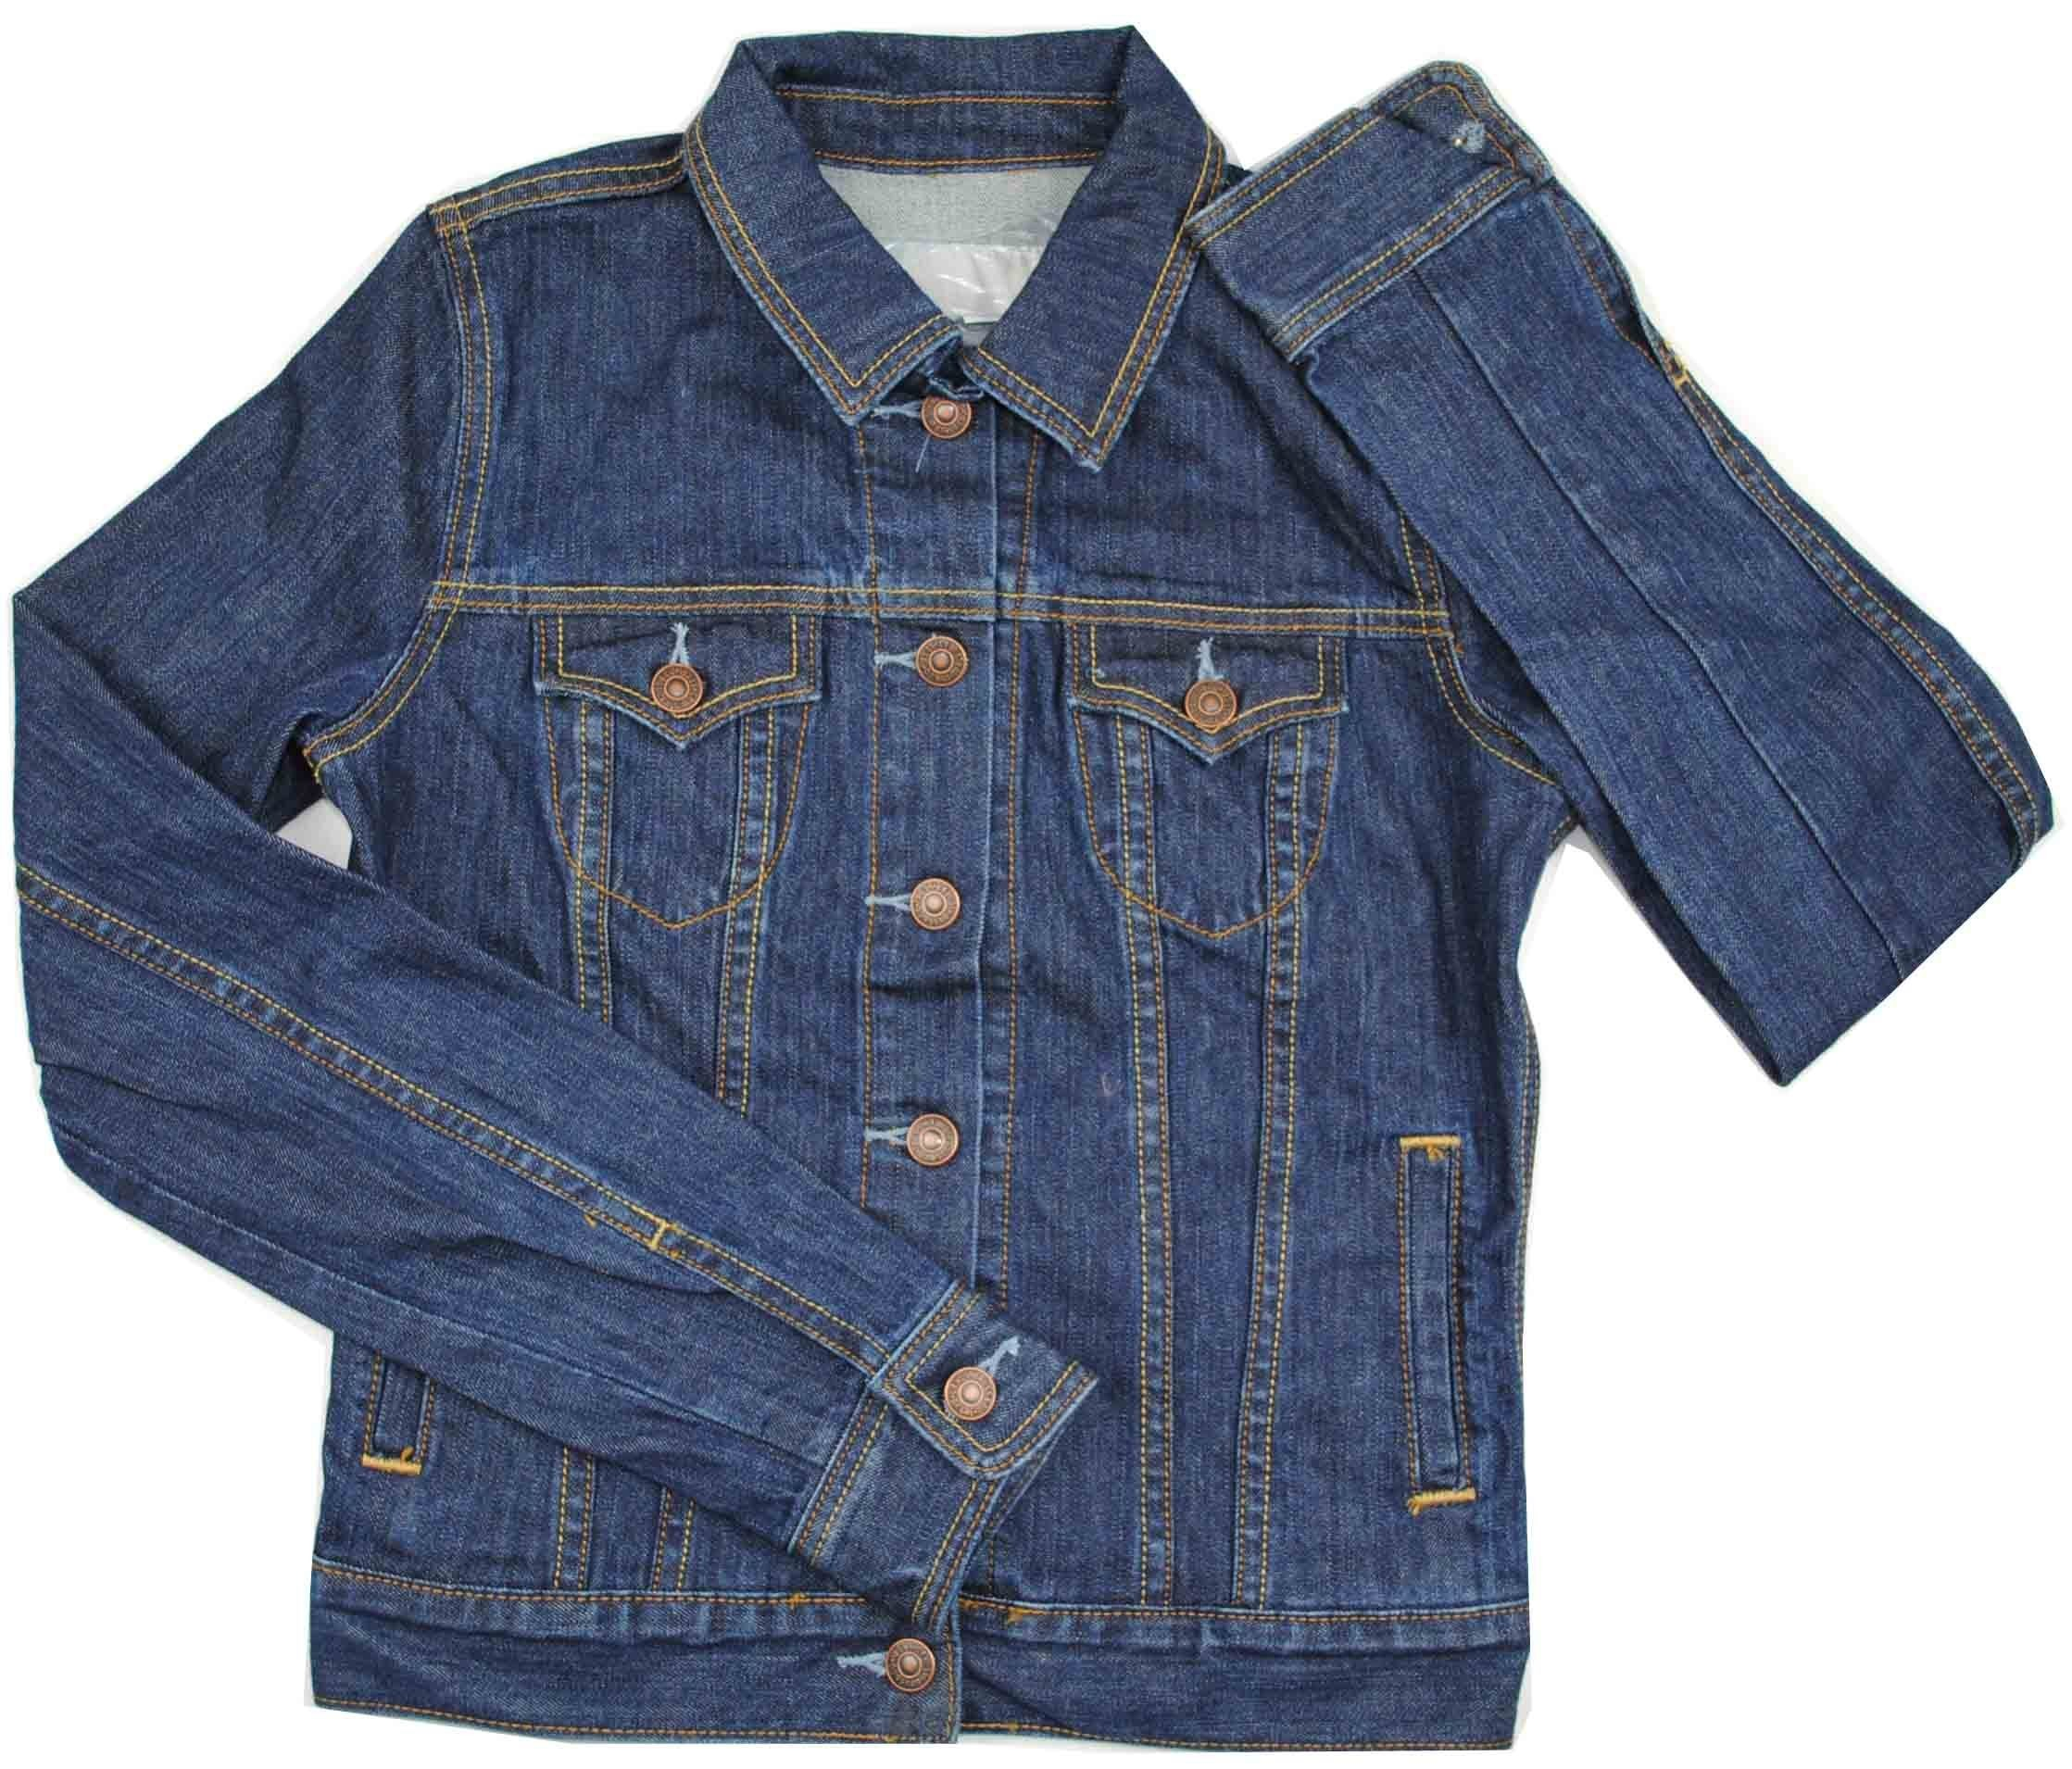 slim fit jean jacket for men jean jacket wholesales